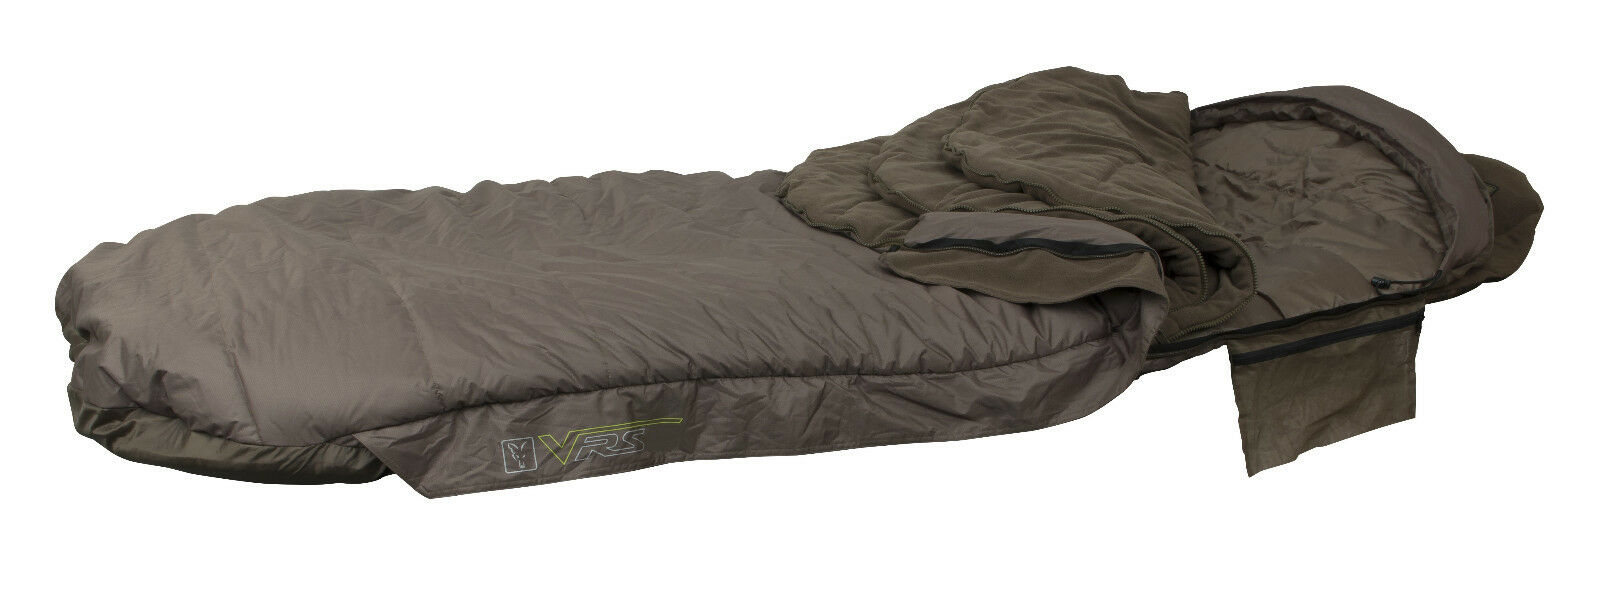 Fox Ventec VRS1 Sleeping Bag CSB037 Schlafsack Sleepingbag Schlaf Sack